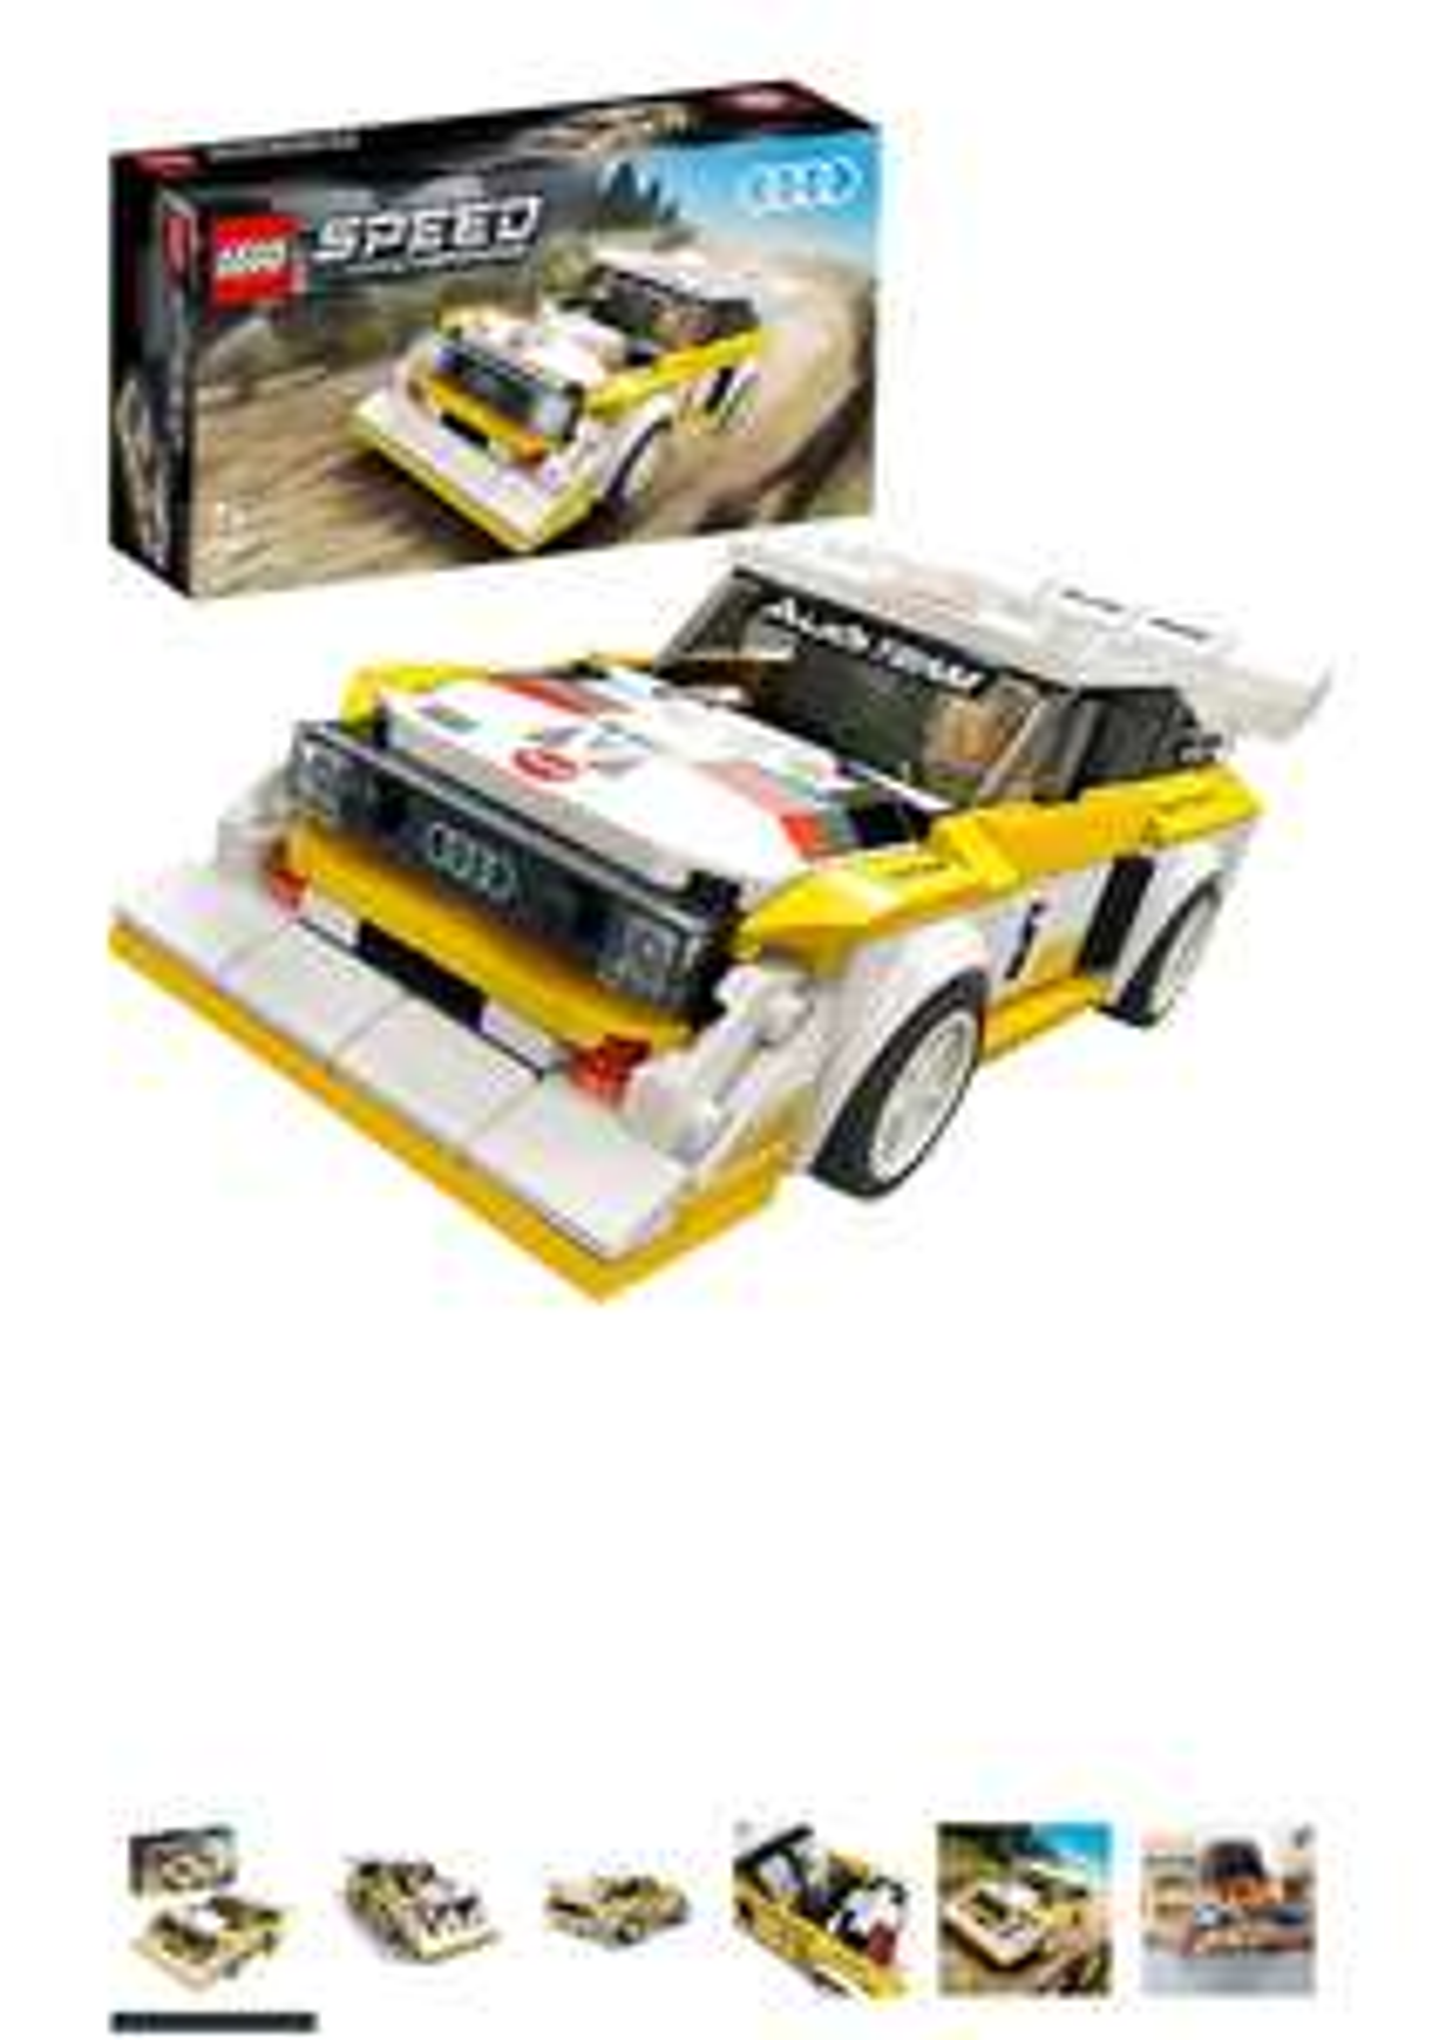 LEGO 76897 Speed Champions Audi Sport quattro S1 Racer Toy with Minifigure Sets £12.84 prime / £17.33 non prime @ Amazon EU (UK mainland)